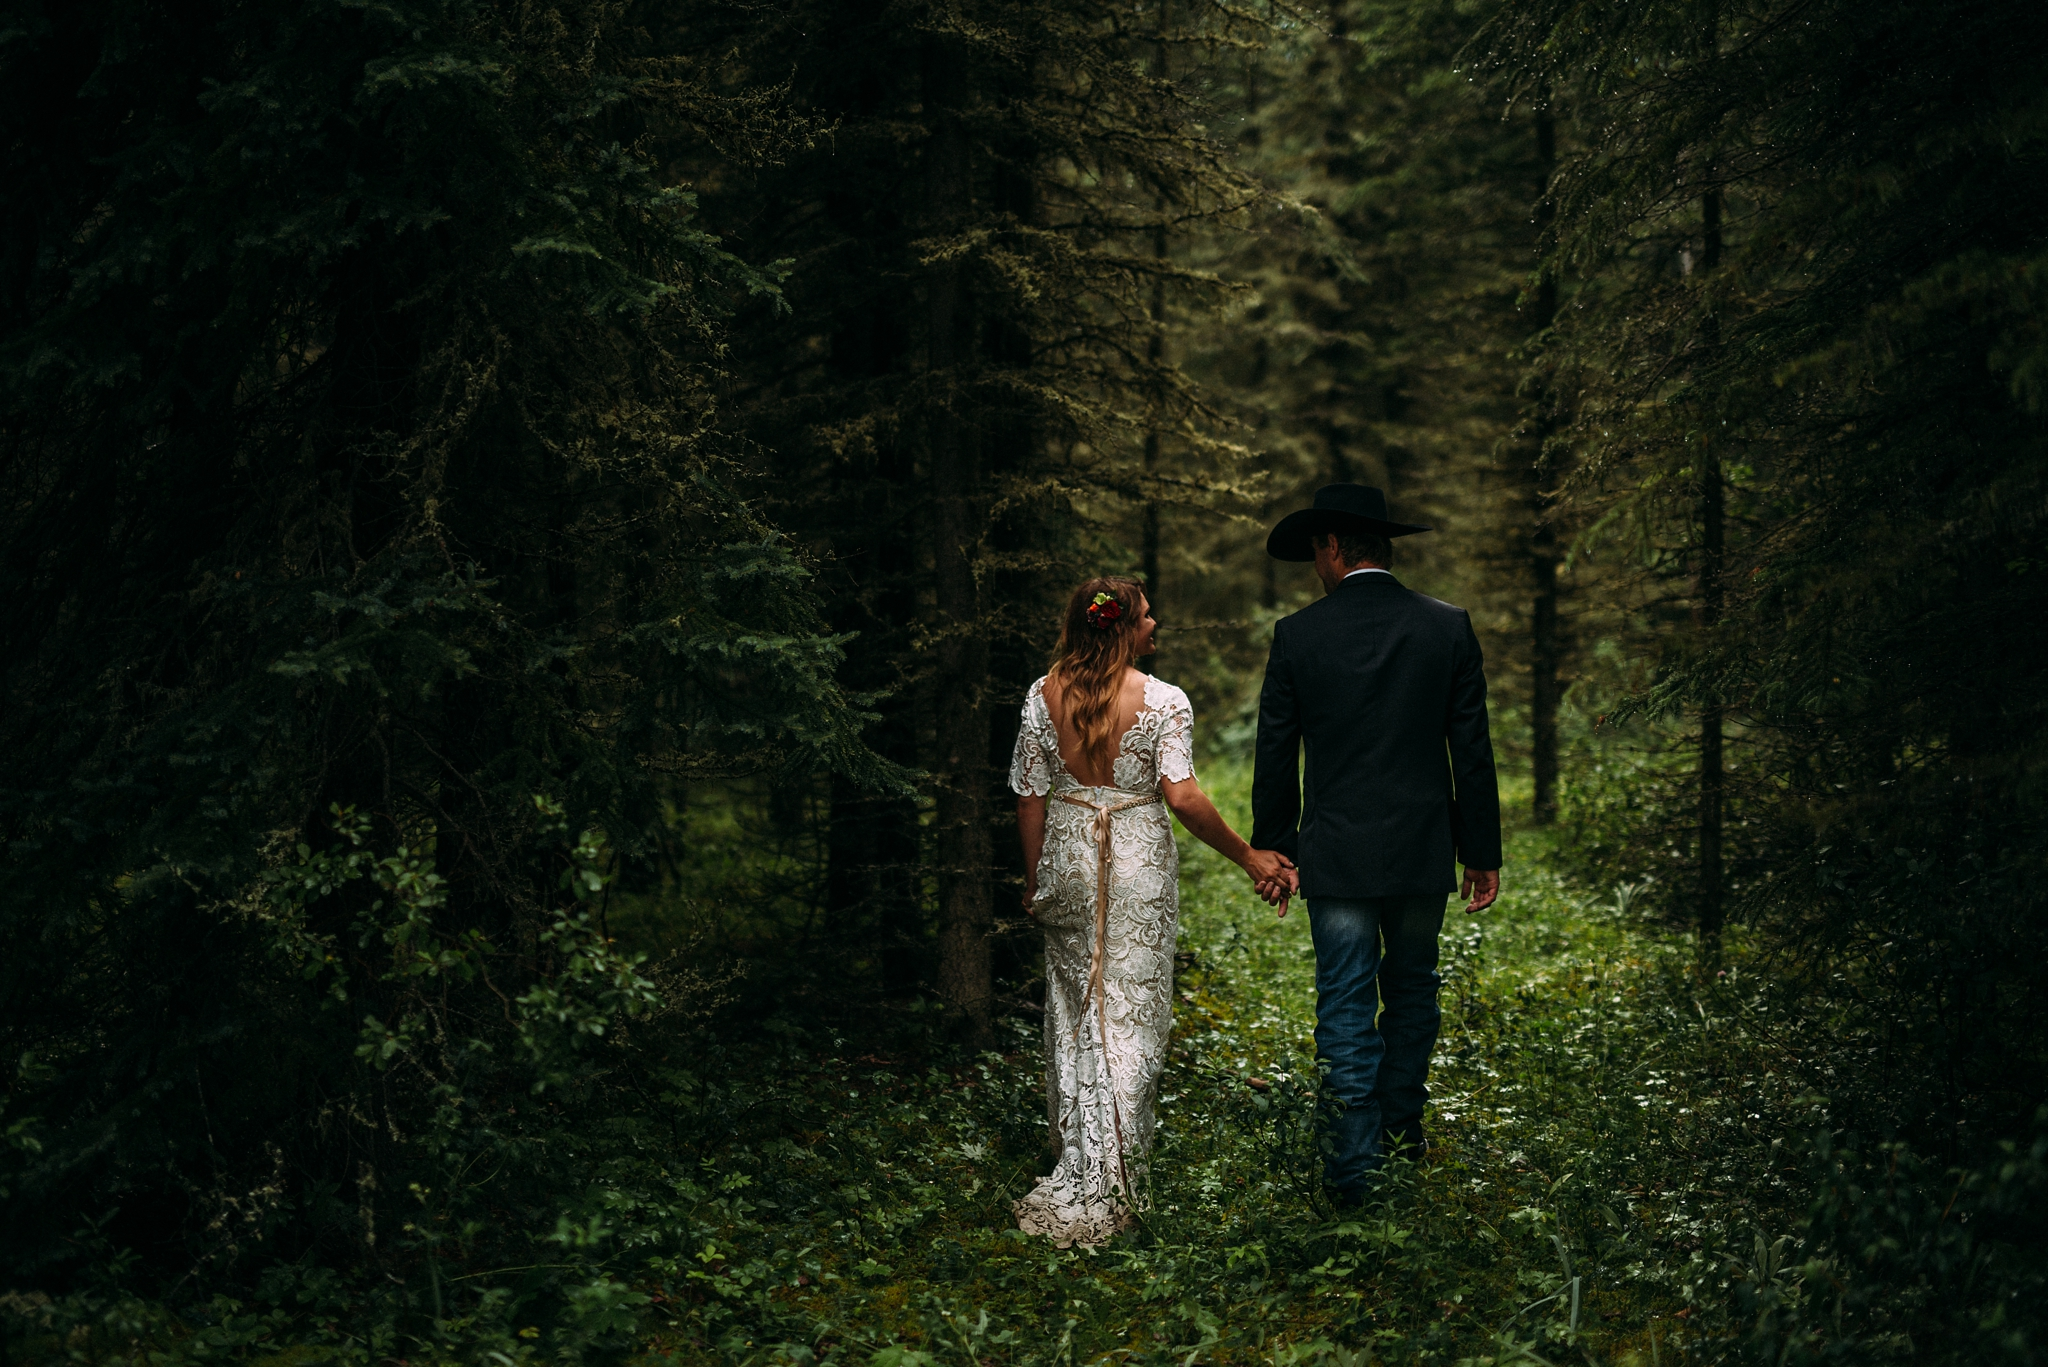 kaihla_tonai_intimate_wedding_elopement_photographer_4257